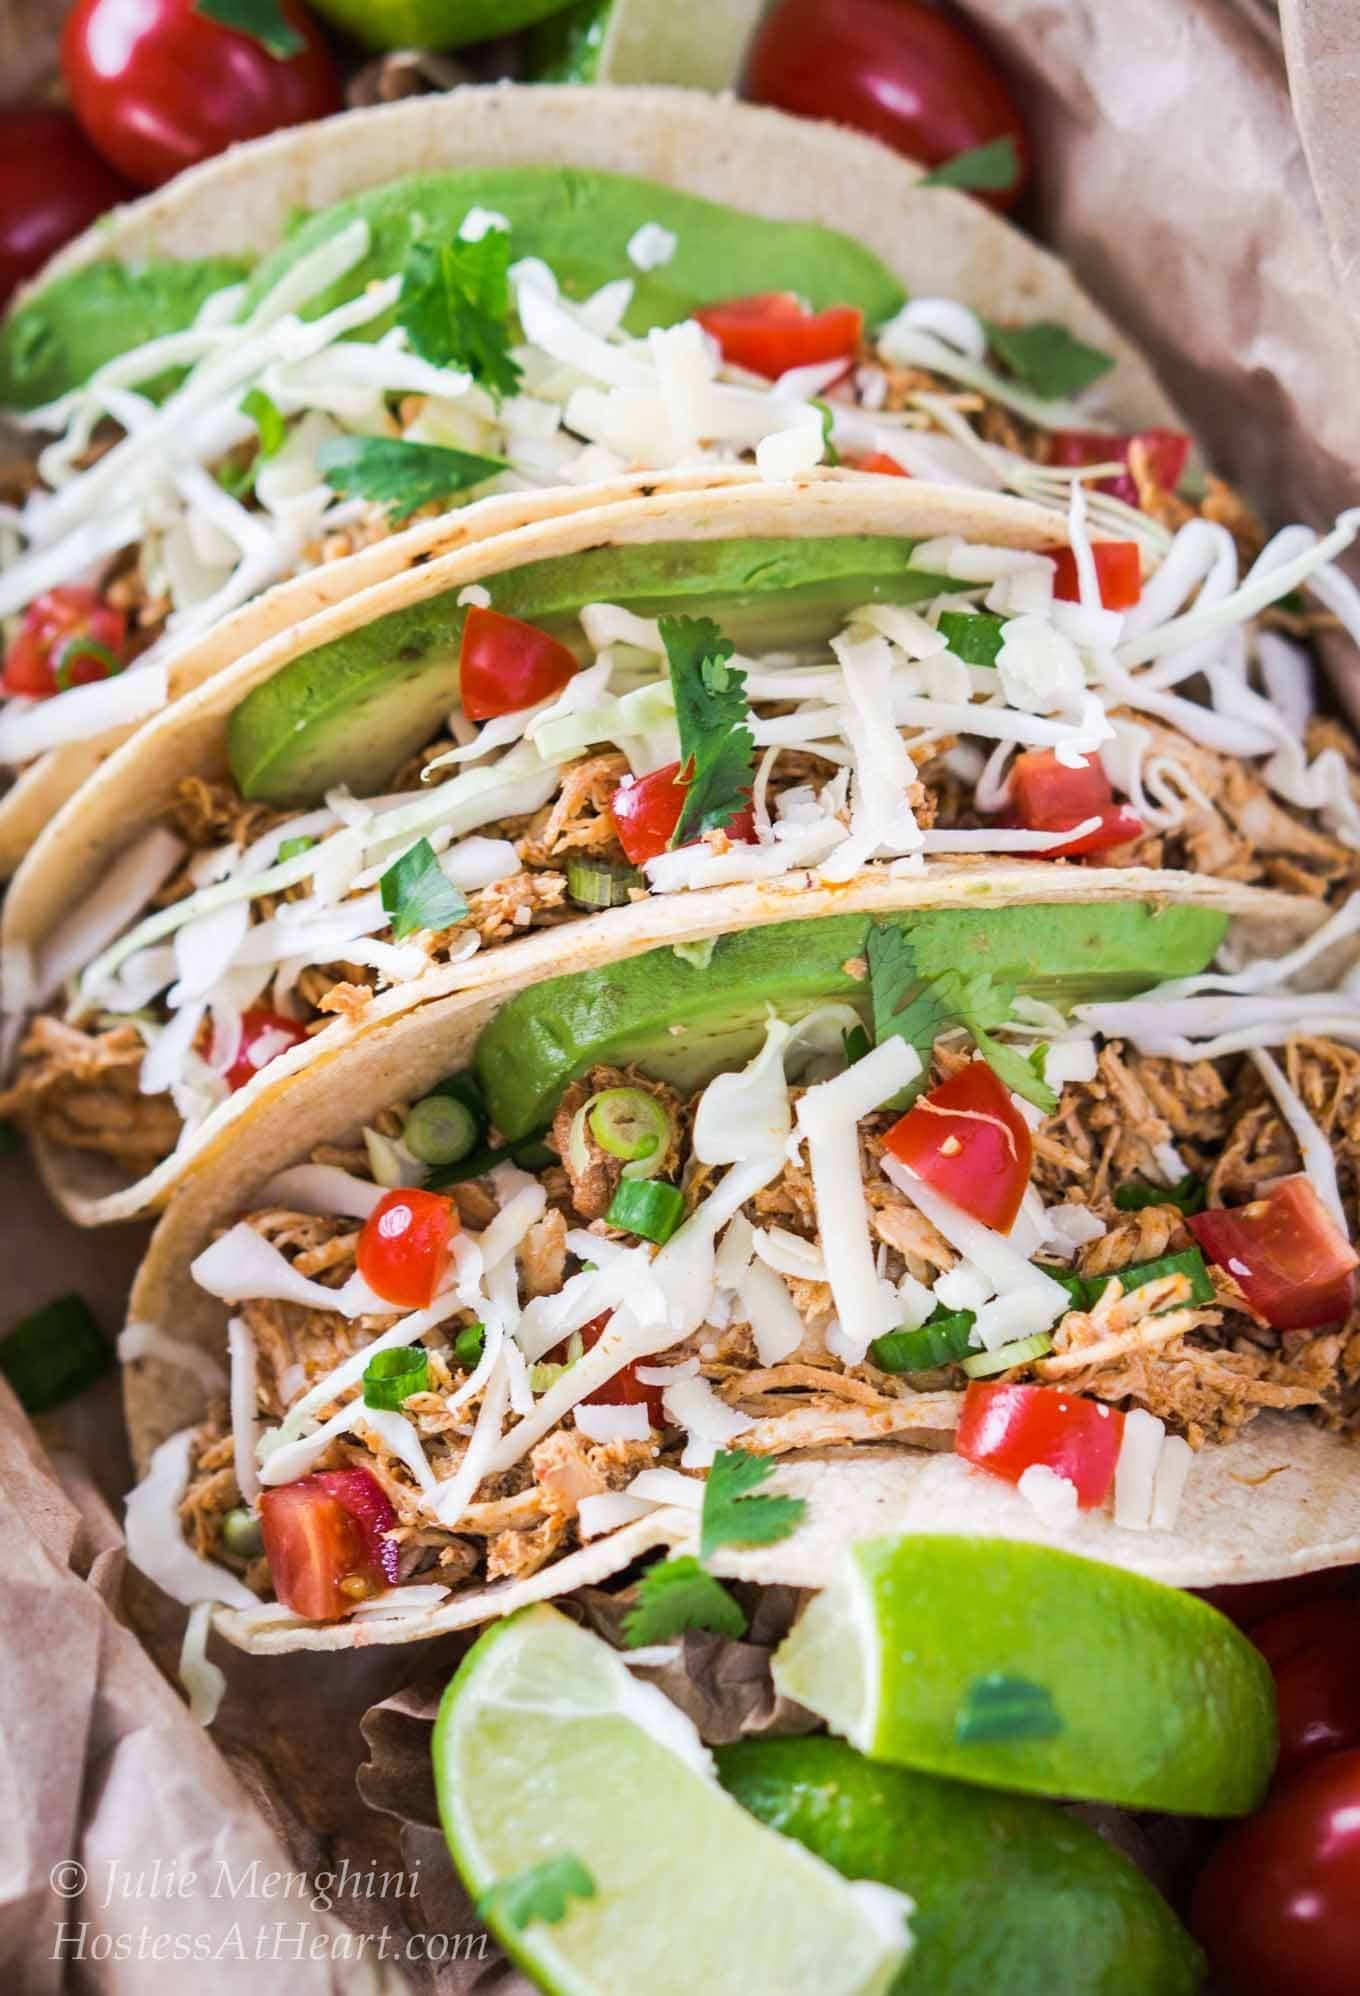 31 Creative Taco Recipes so you can have a different taco every day! Taco Tuesday   Steak Tacos   Chicken Tacos   Beef Tacos   Fish Tacos   Pork Tacos   Veggie tacos   Cinco De Mayo Recipes